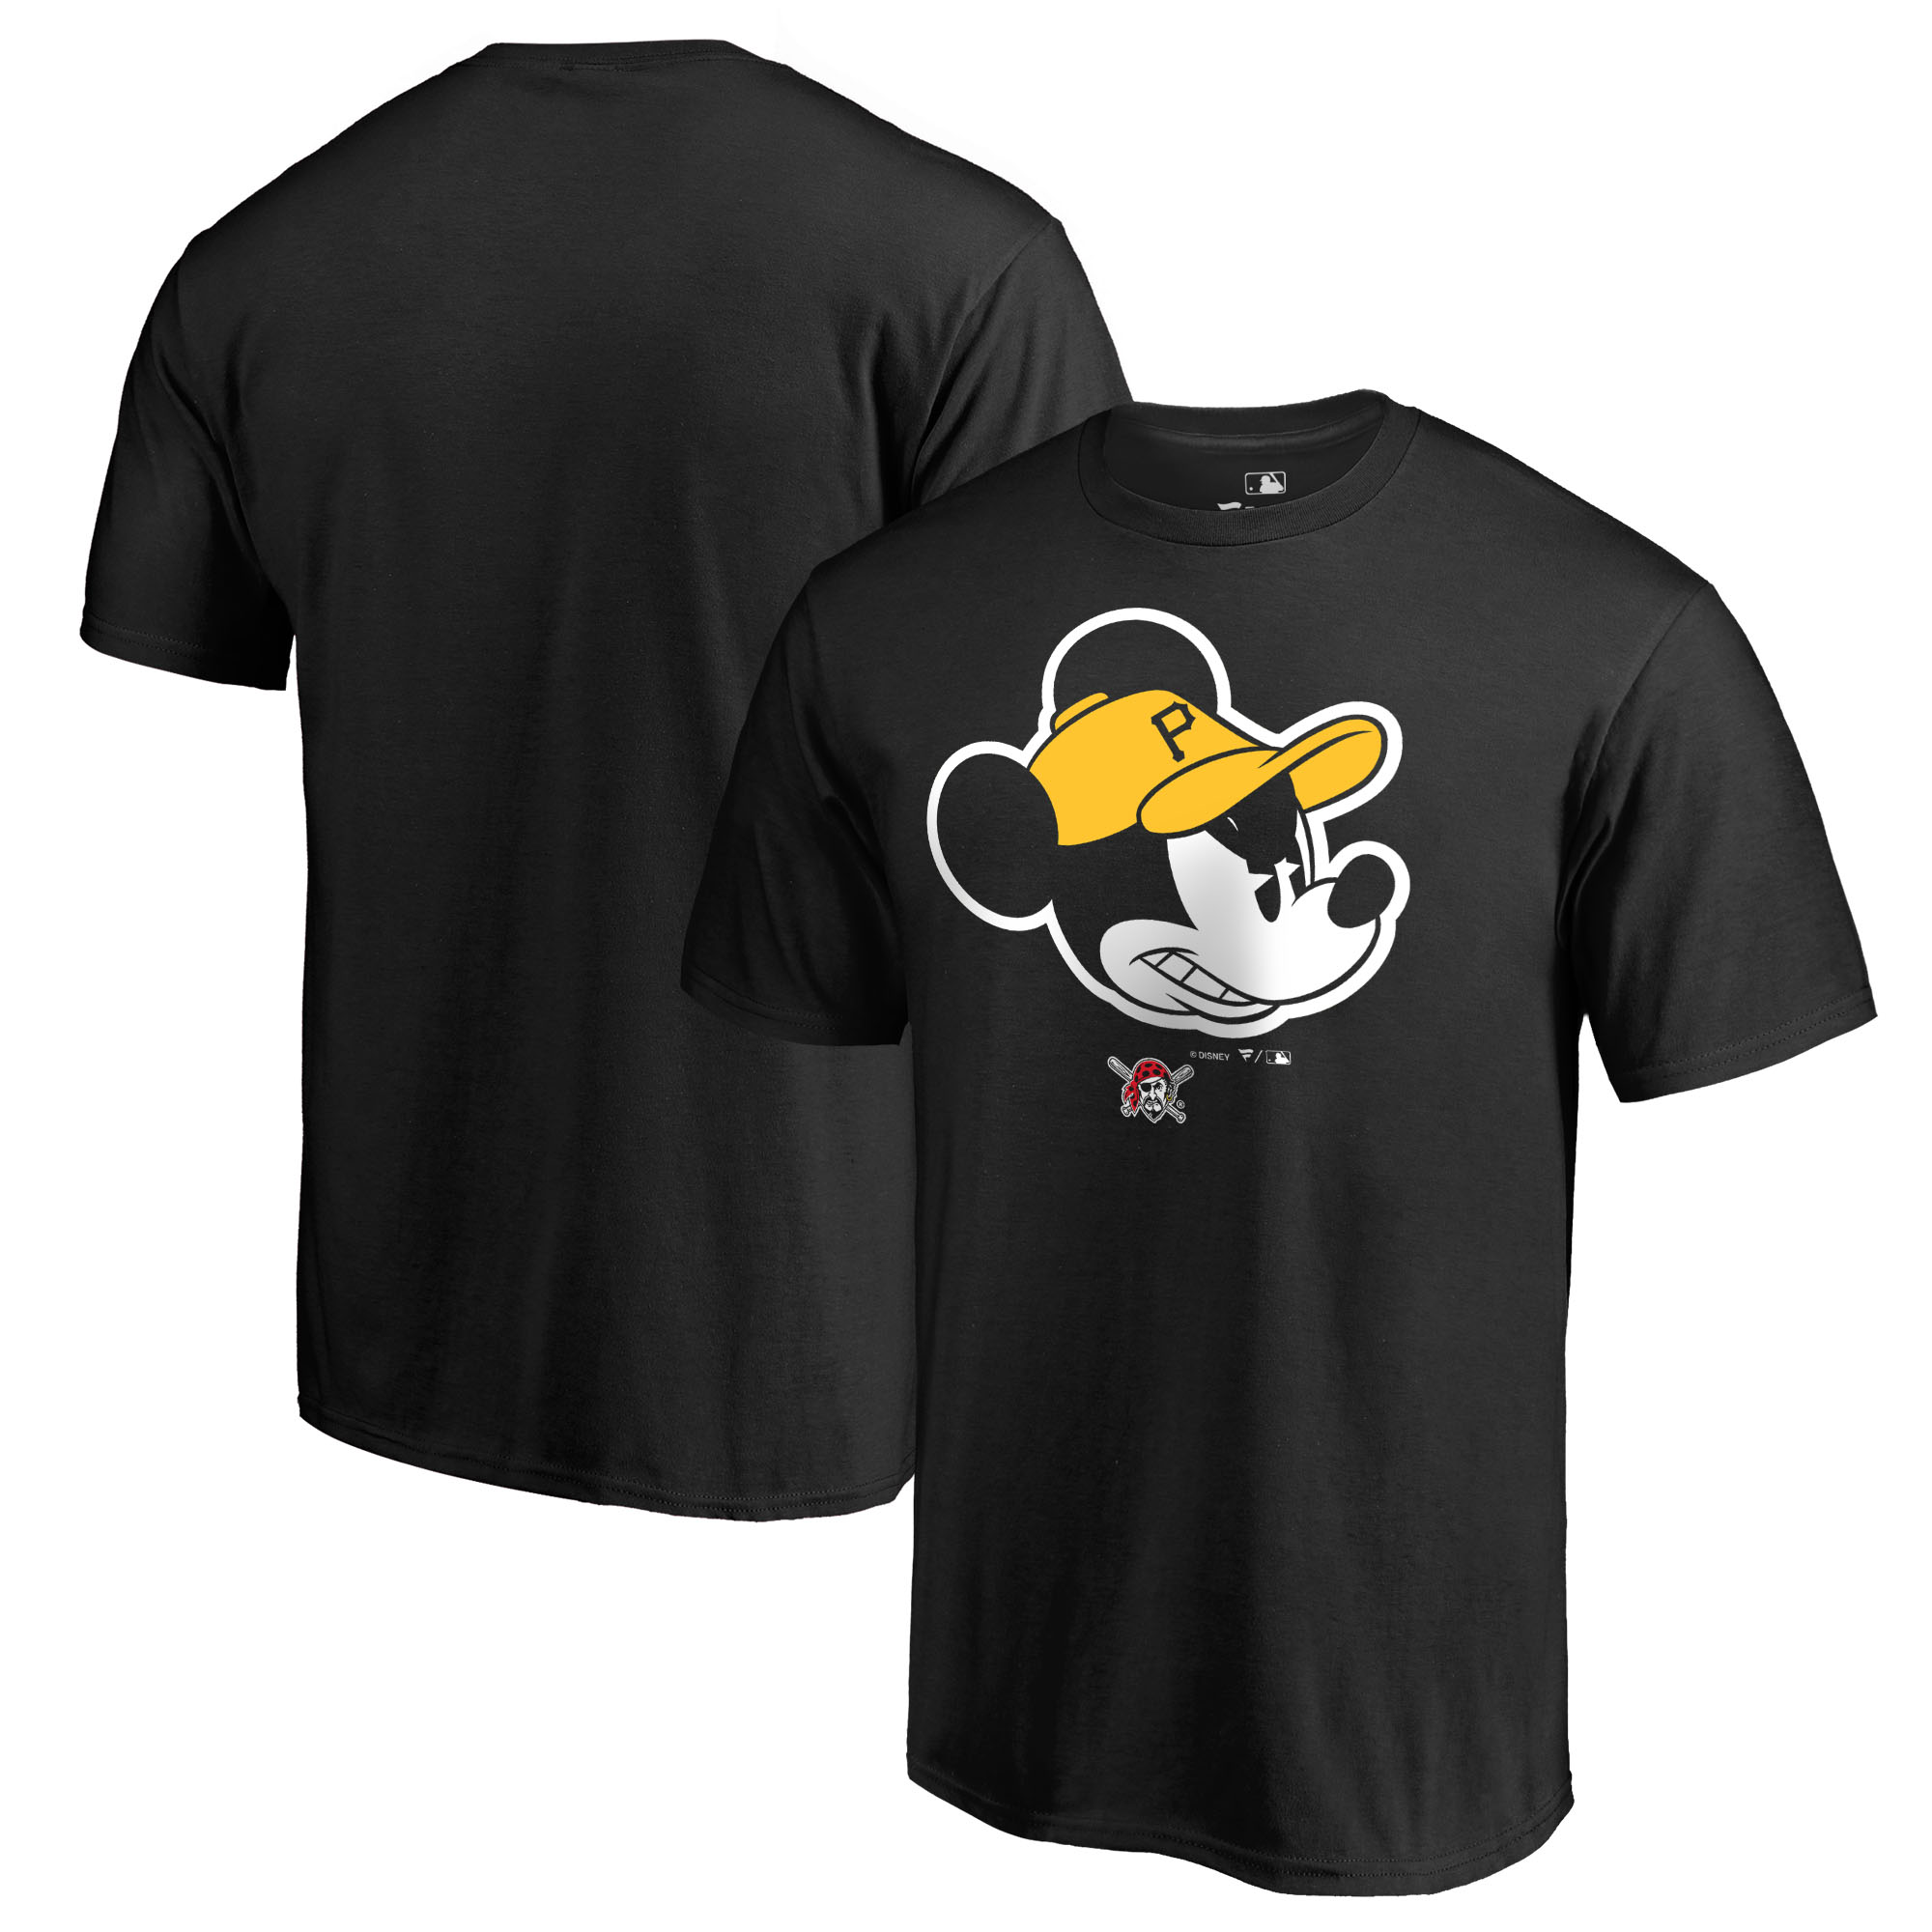 Pittsburgh Pirates Fanatics Branded Disney Game Face T-Shirt - Black